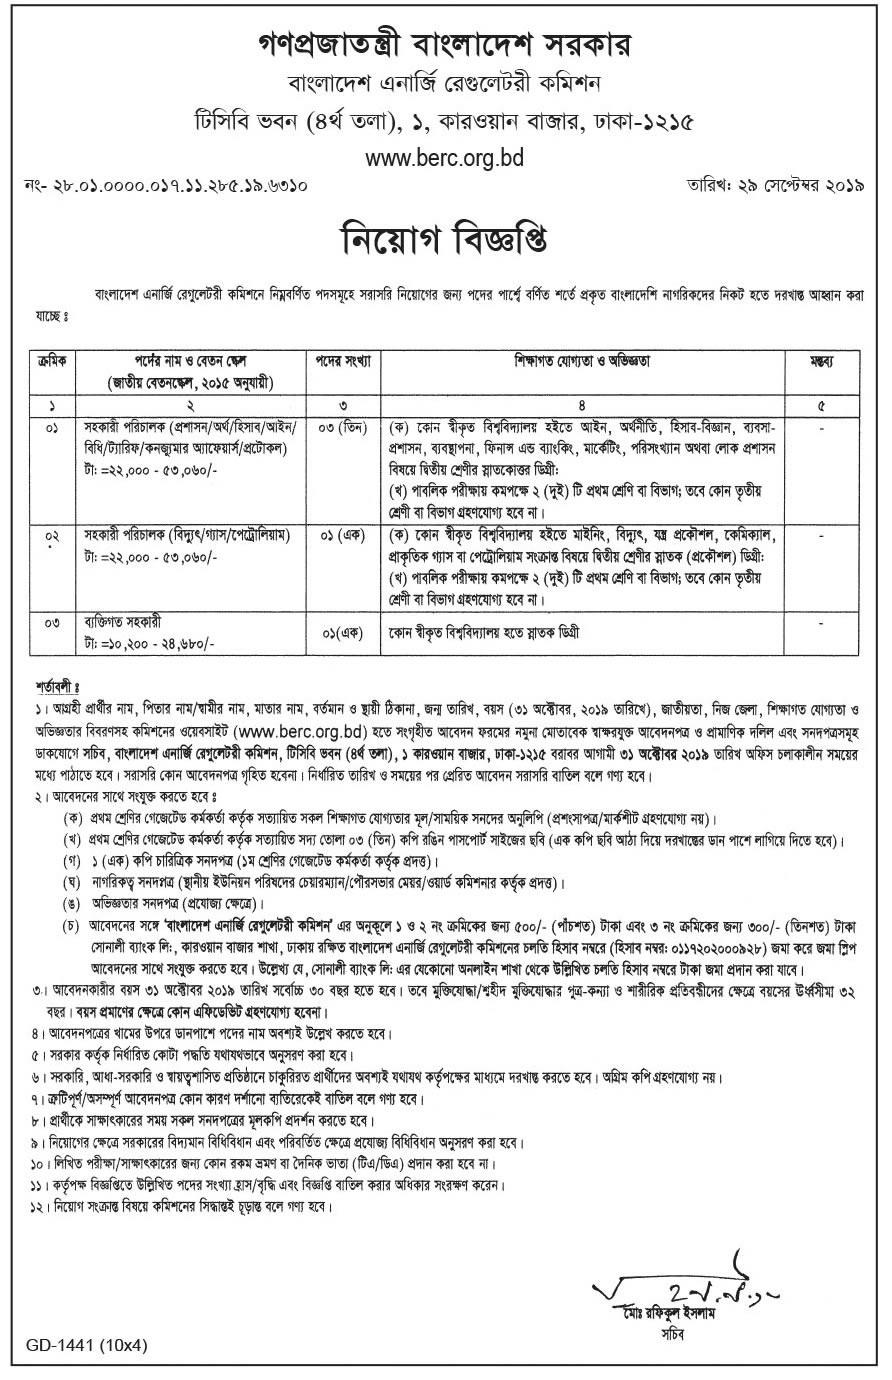 Bangladesh Energy Regulatory Commission (BERC) Job Circular 2019